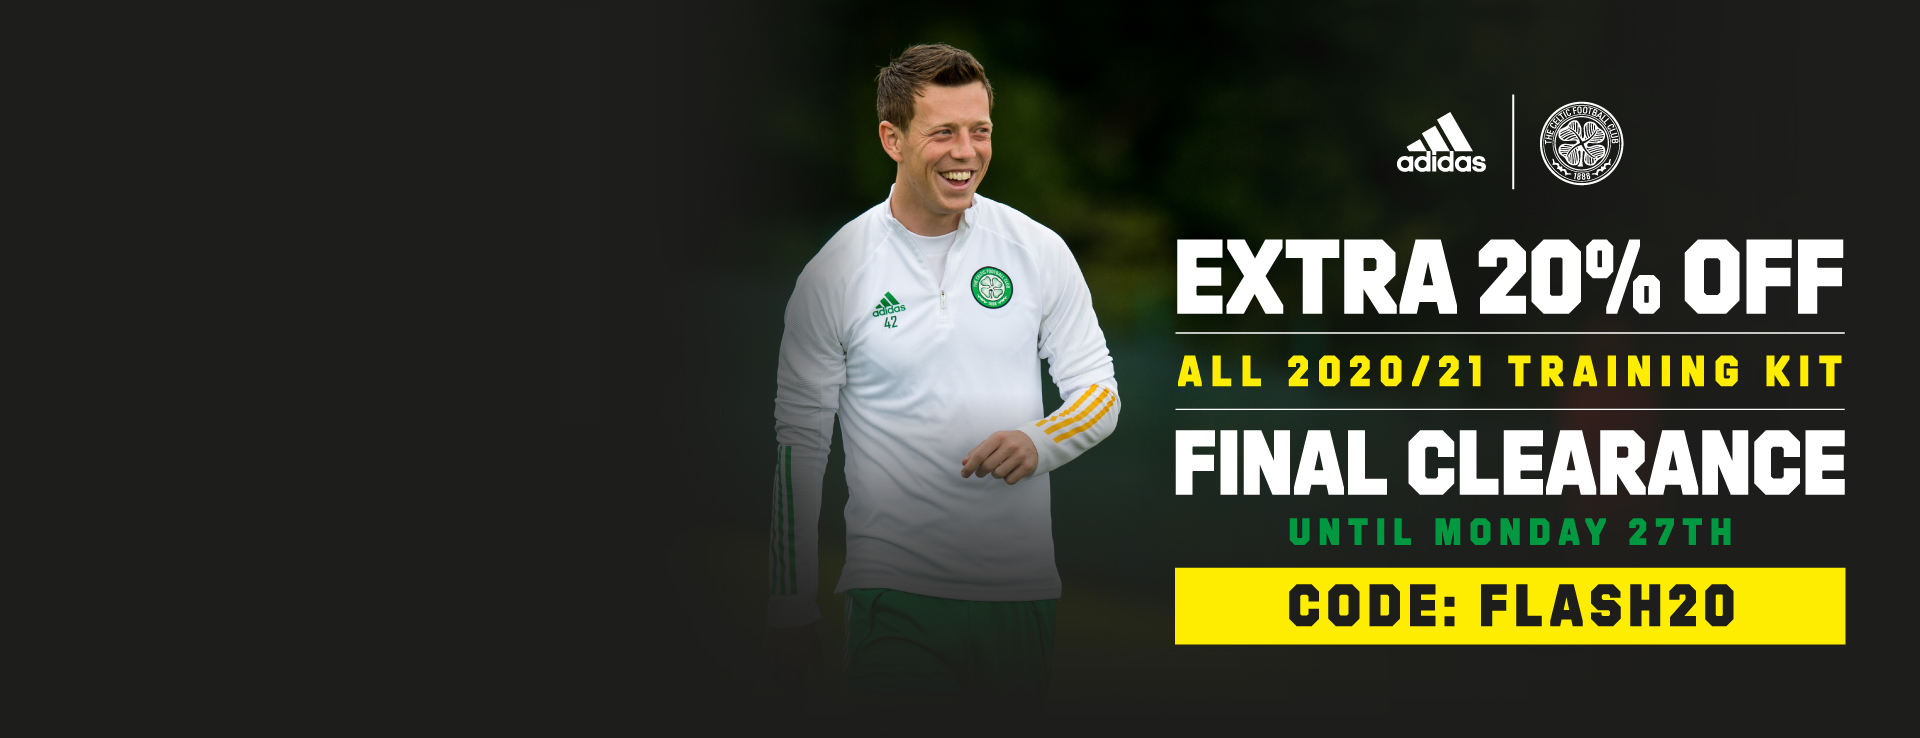 Celtic FC extra 20% off old season Training Kit